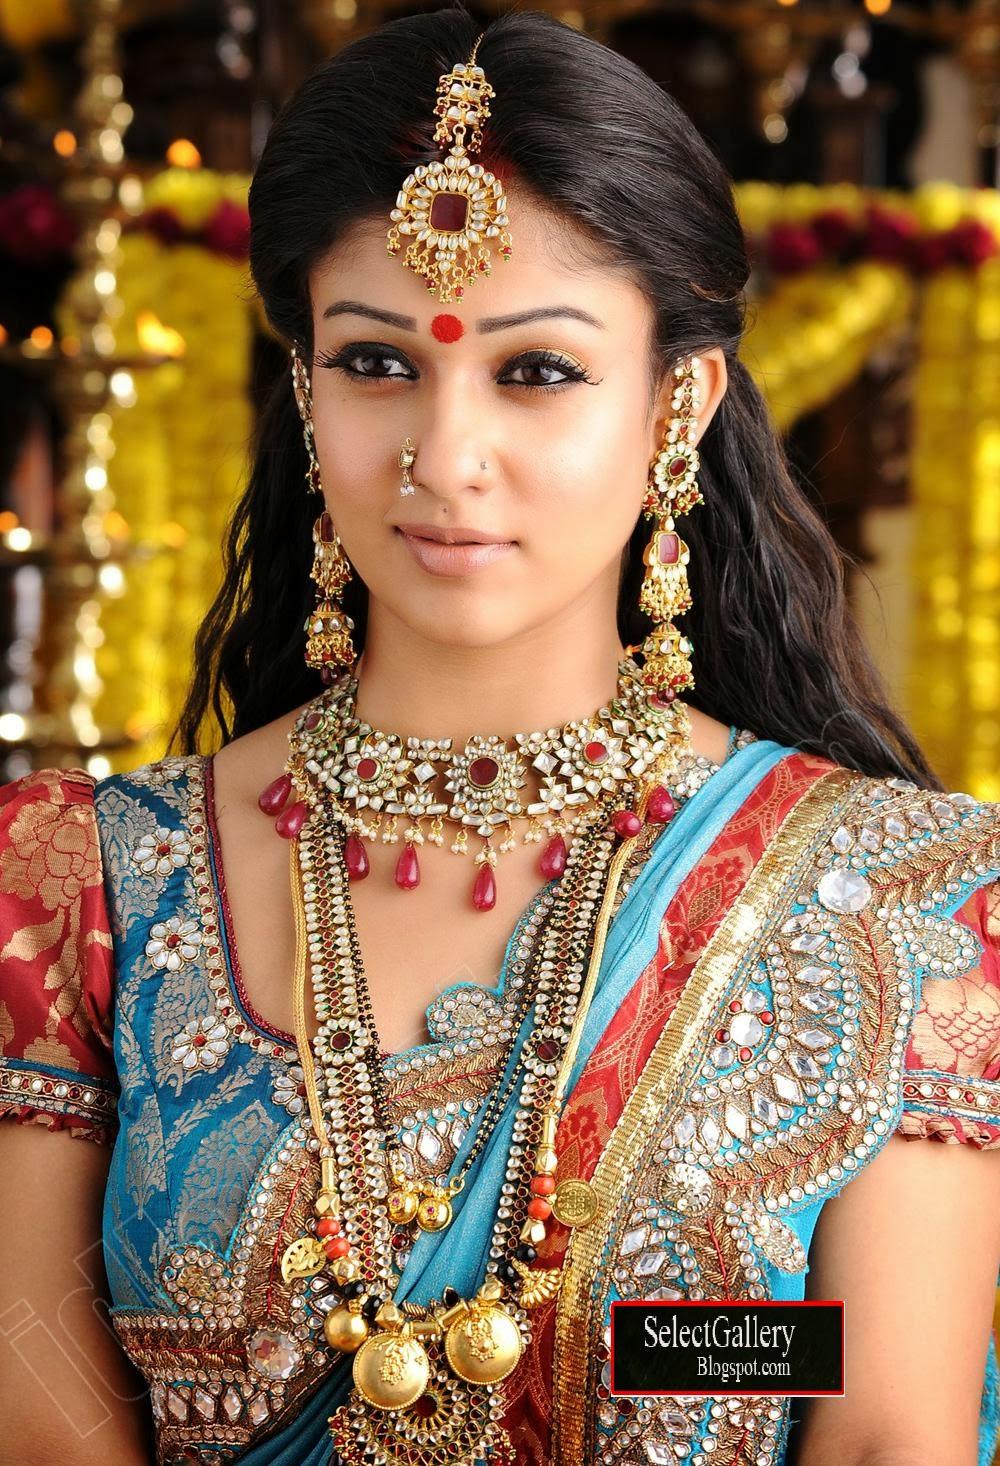 nayanthara actress indian wear looks tara saree south traditional stylish nayantara idlebrain sahaja film actresses open chil buli celebrity telugu